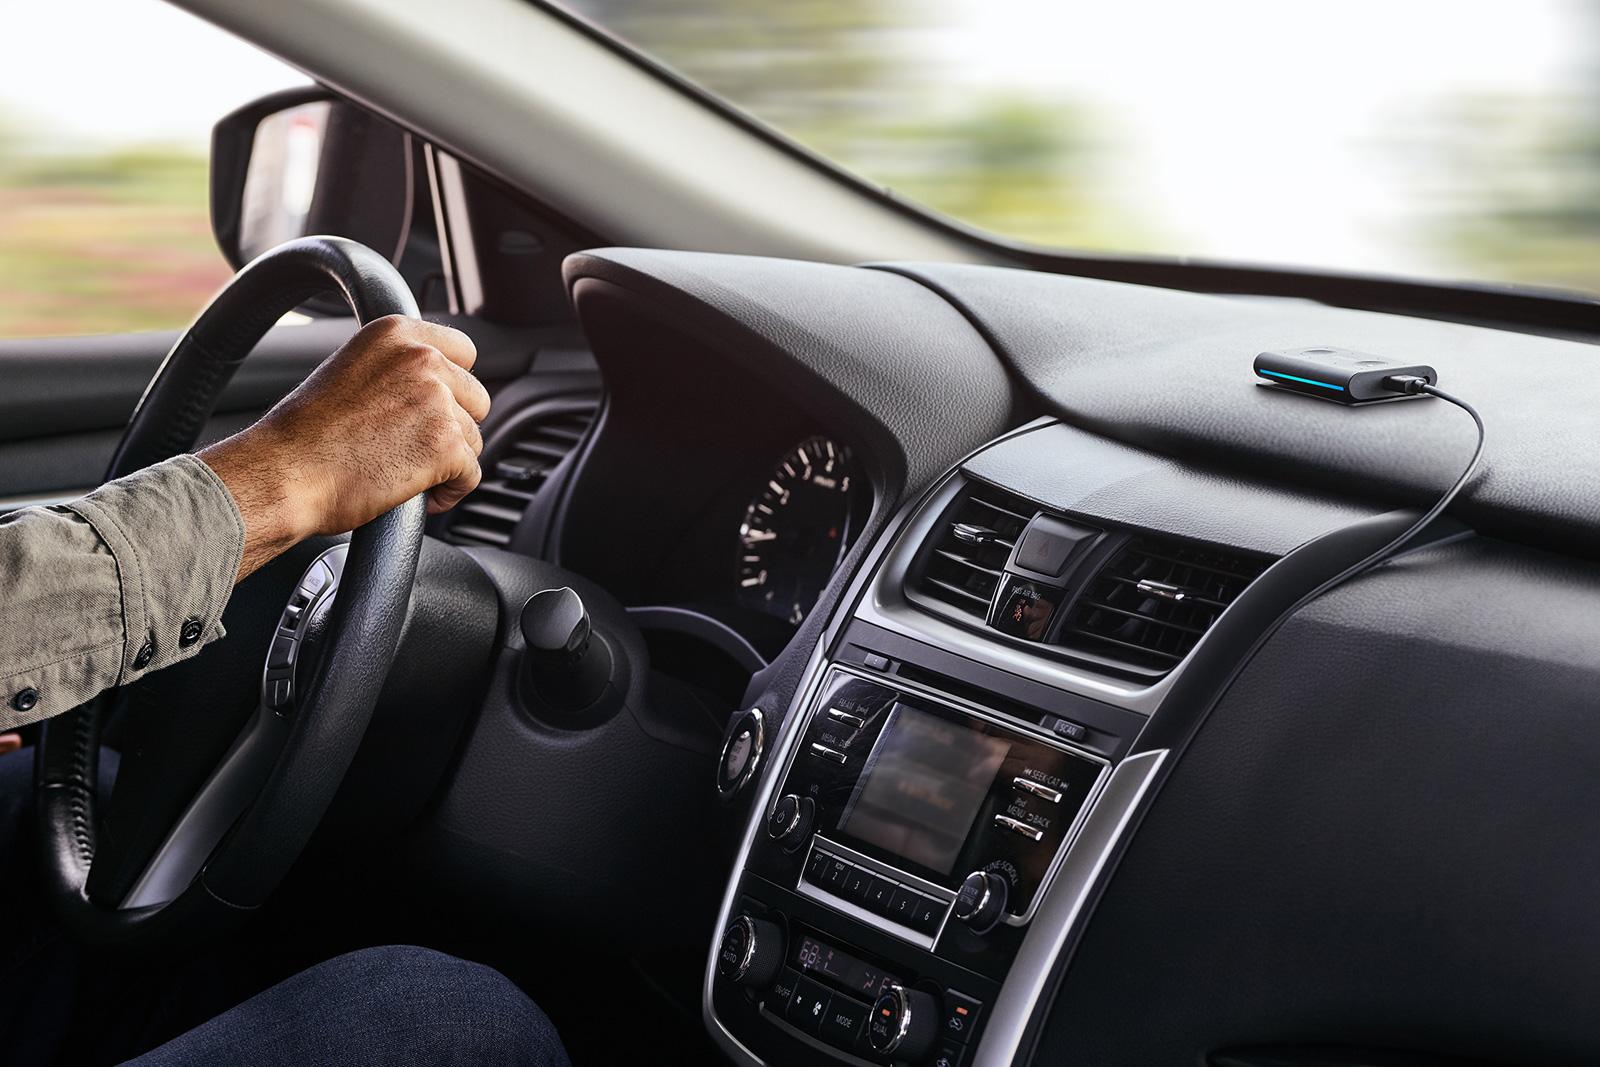 Amazon S Echo Auto Puts Alexa In Any Car Engadget